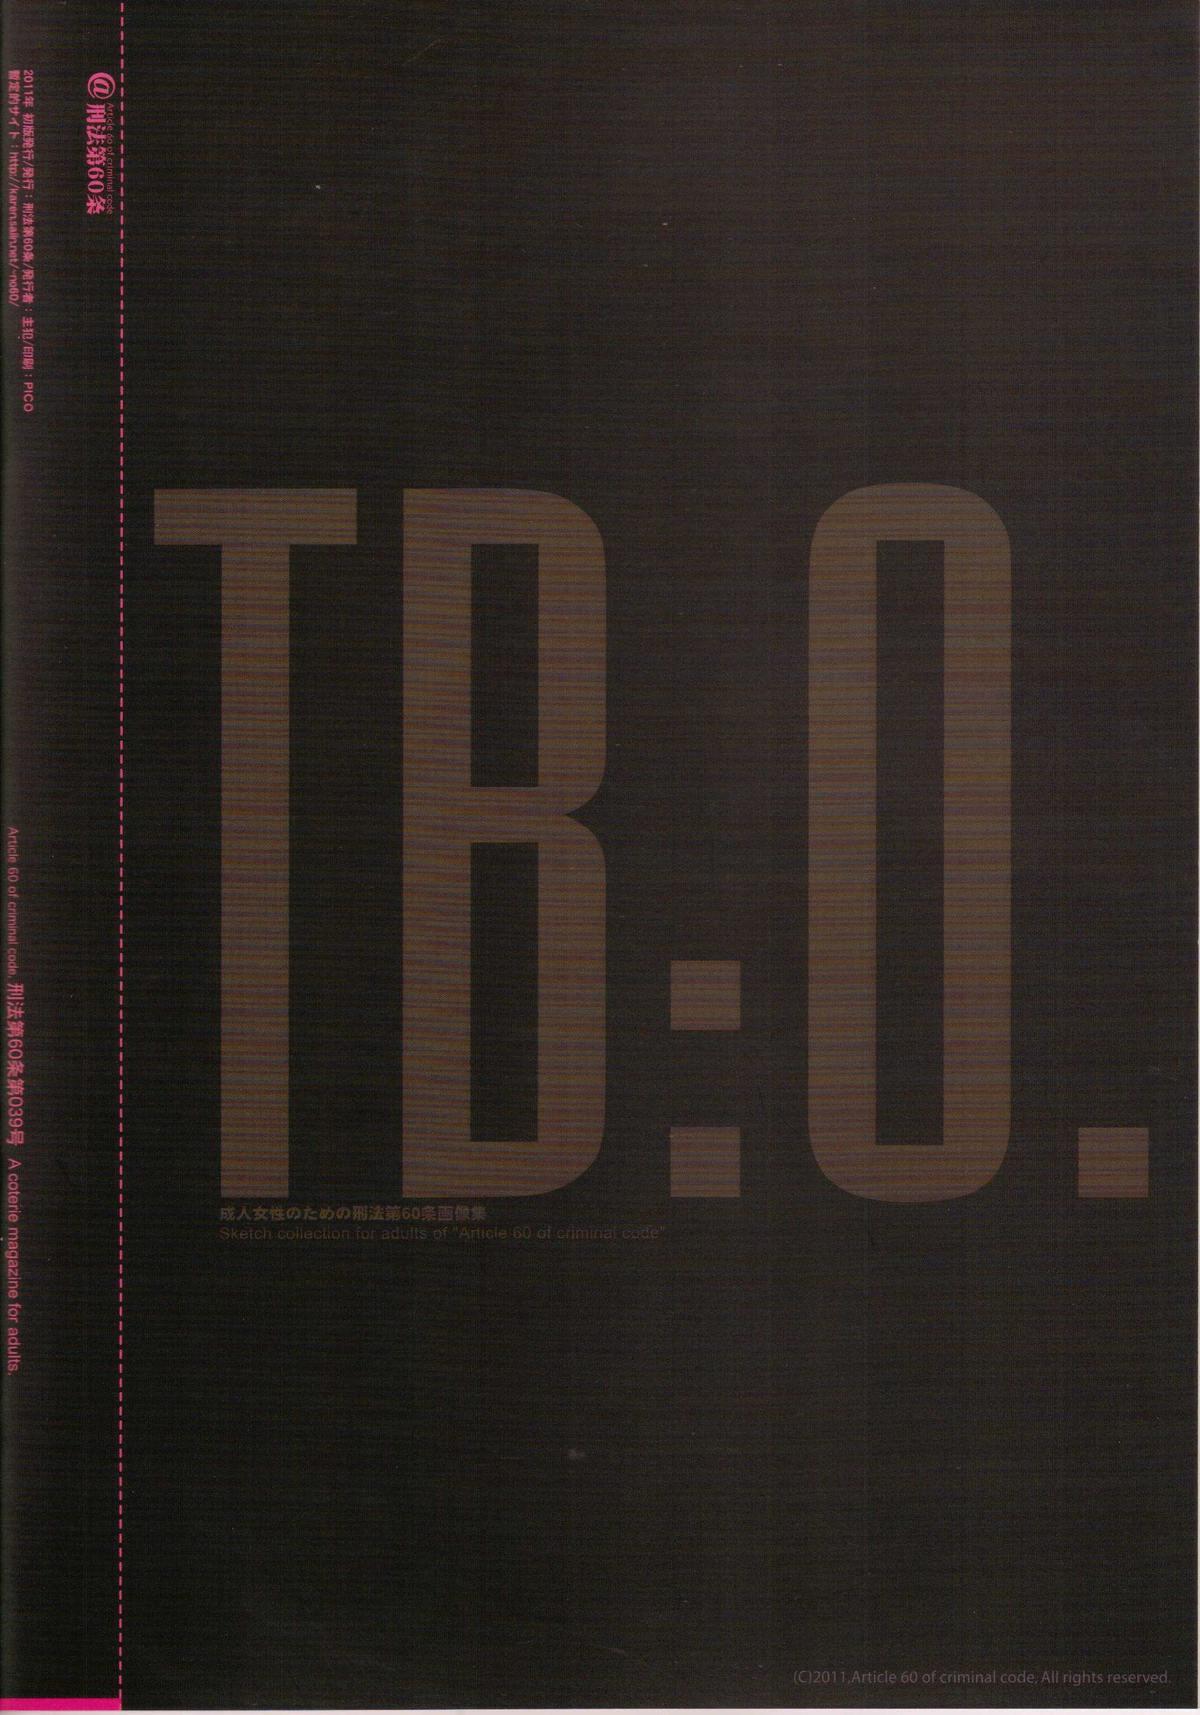 TB:0. 23